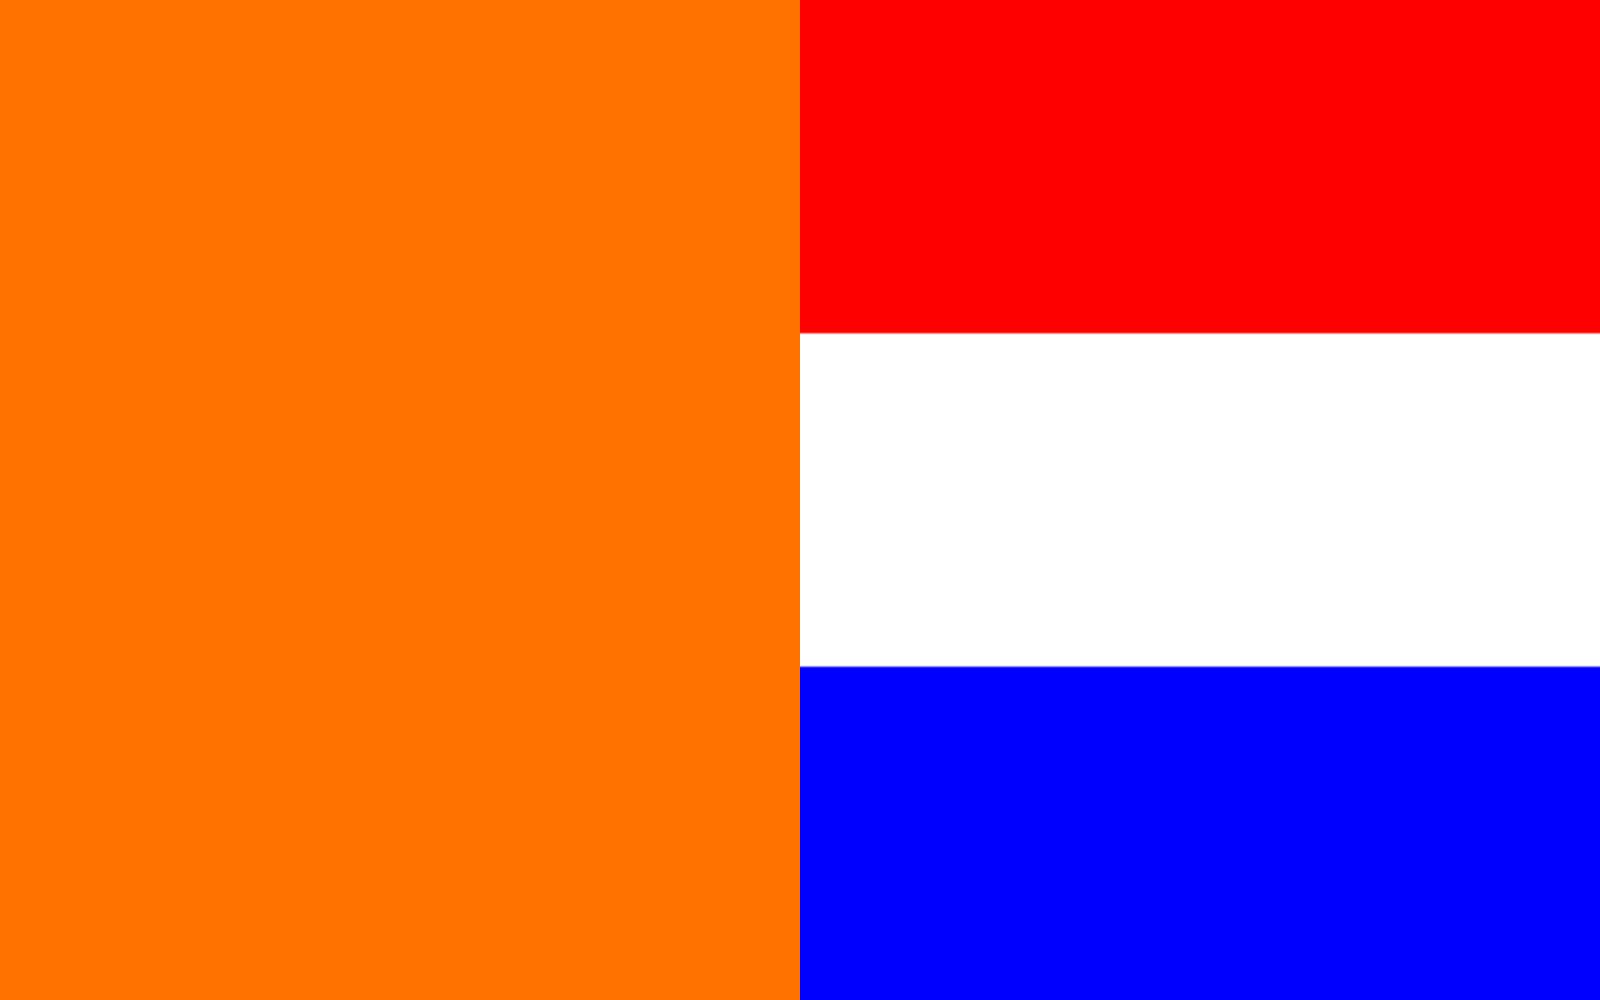 http://4.bp.blogspot.com/-UAATXPvM63A/UXlDaaon7HI/AAAAAAAAO2k/jcEMemd7CTU/s1600/oranje-rood-wit-blauw-wallpaper-met-nederlandse-vlag-leuke-bureaublad-achtergrond-om-te-gebruiken-met-koninginnedag-koningdag-of-ander-oranjefeest.jpg